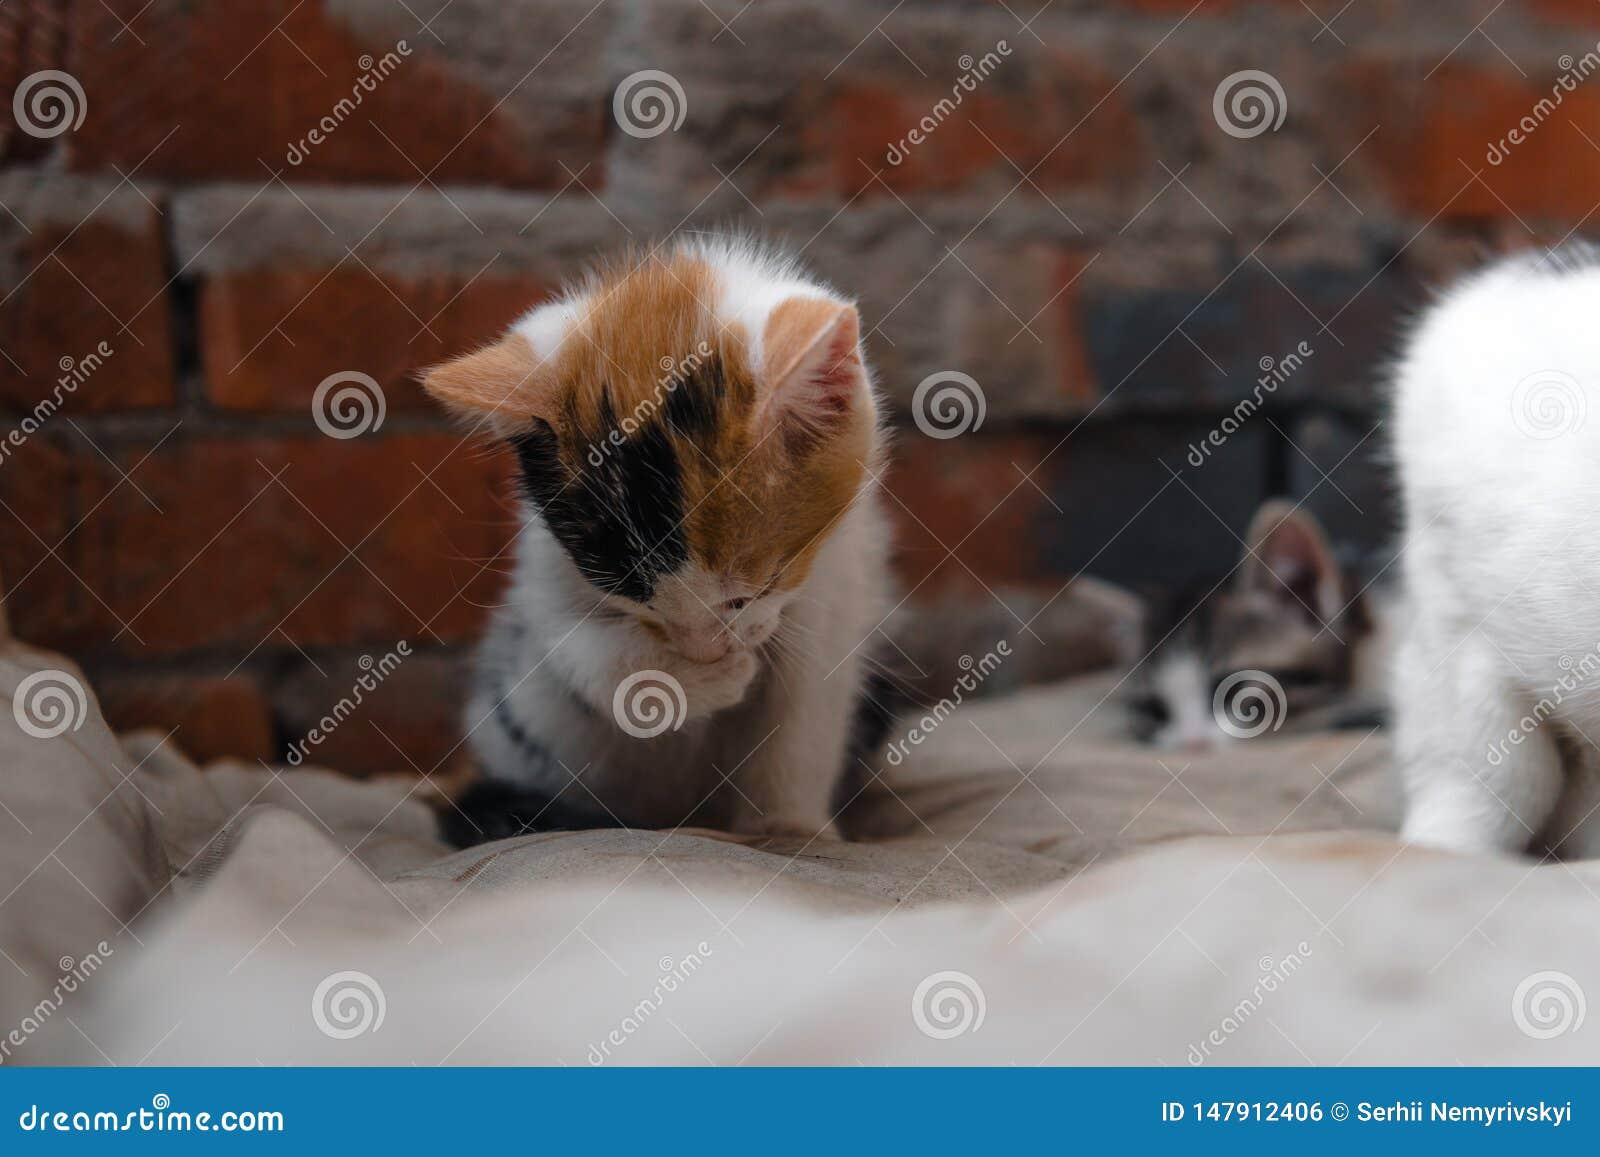 Bezdomna figlarka, samotna, kot, koty ulica potrzeba przyjaciele